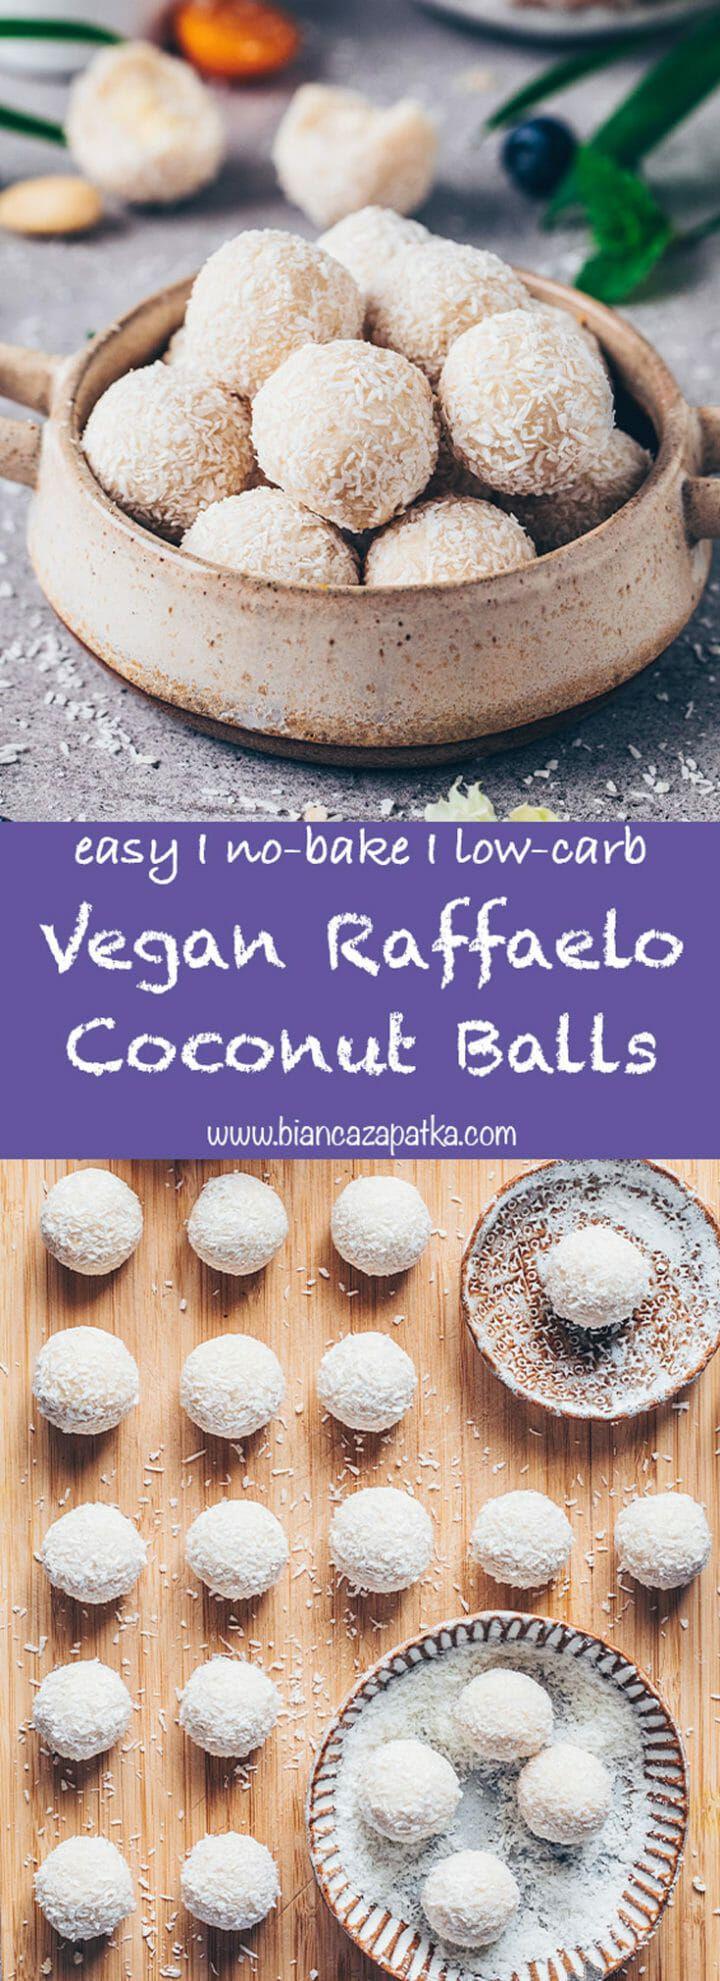 Vegan Raffaelo (Easy Coconut Balls) | Recipe in 2020 ...